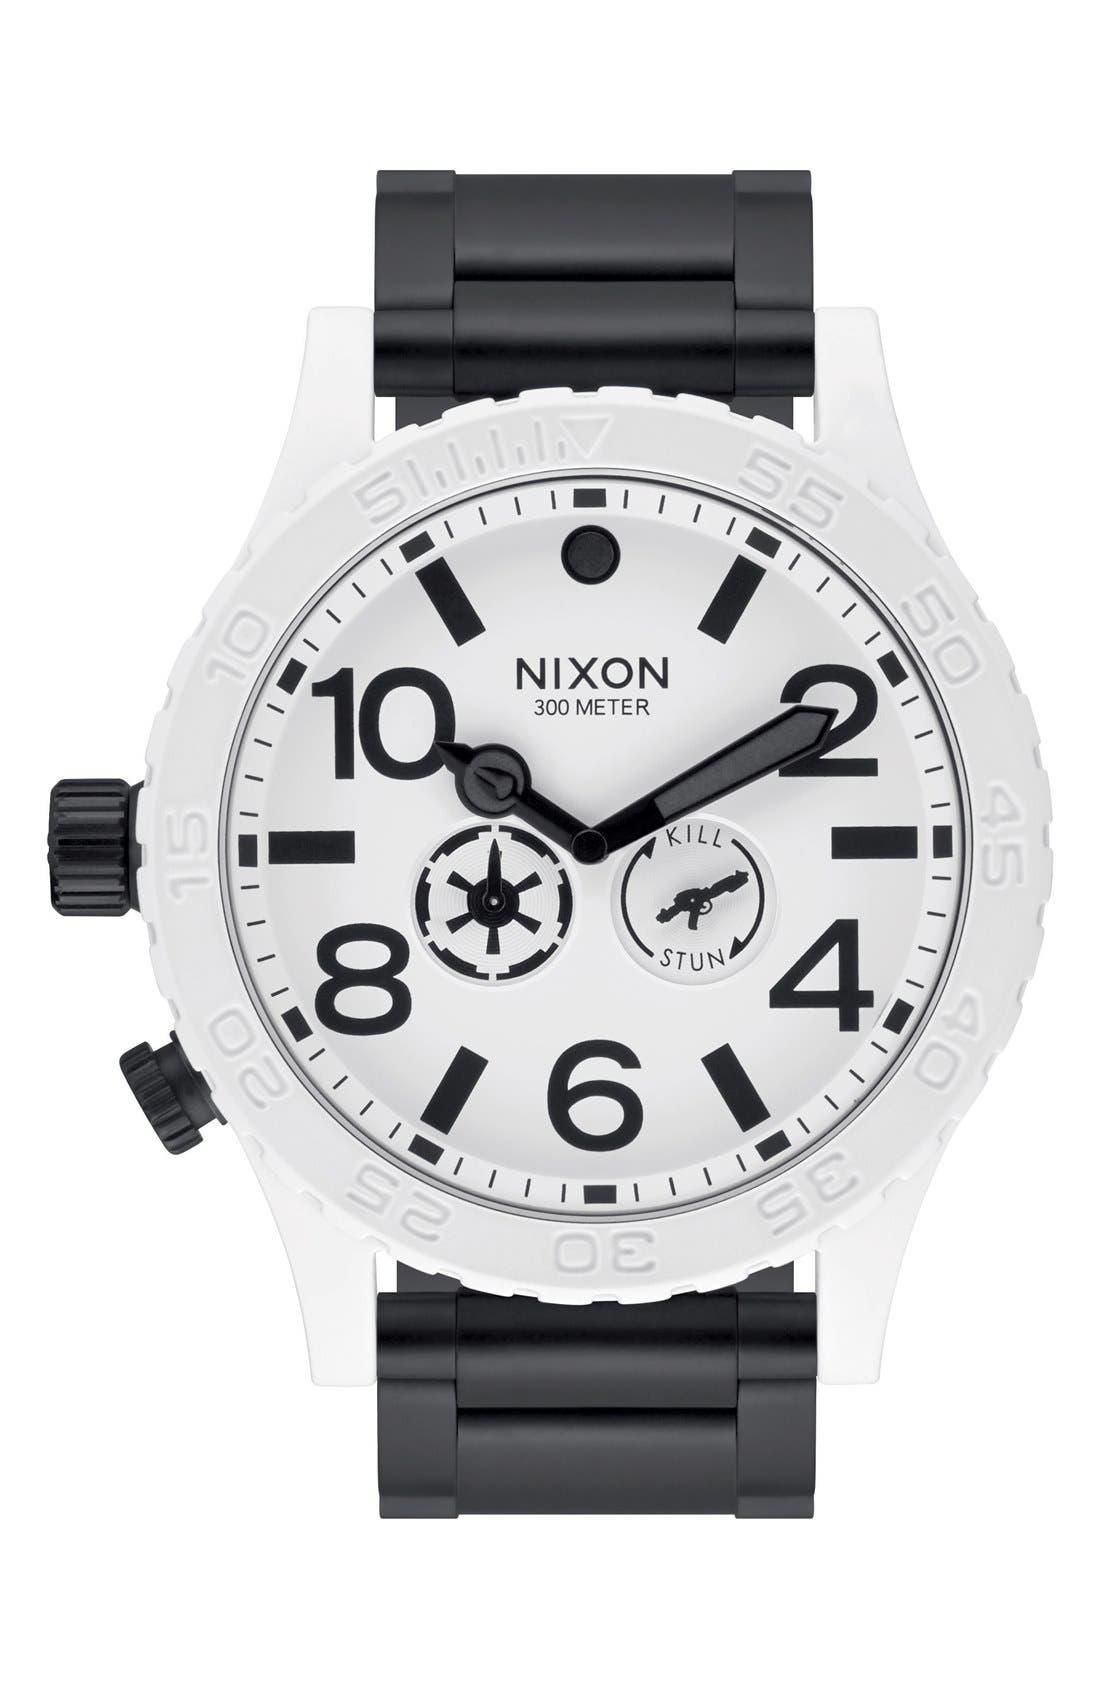 Main Image - Nixon 'Star Wars™ - The 51-30 Stormtrooper' Bracelet Watch, 51mm